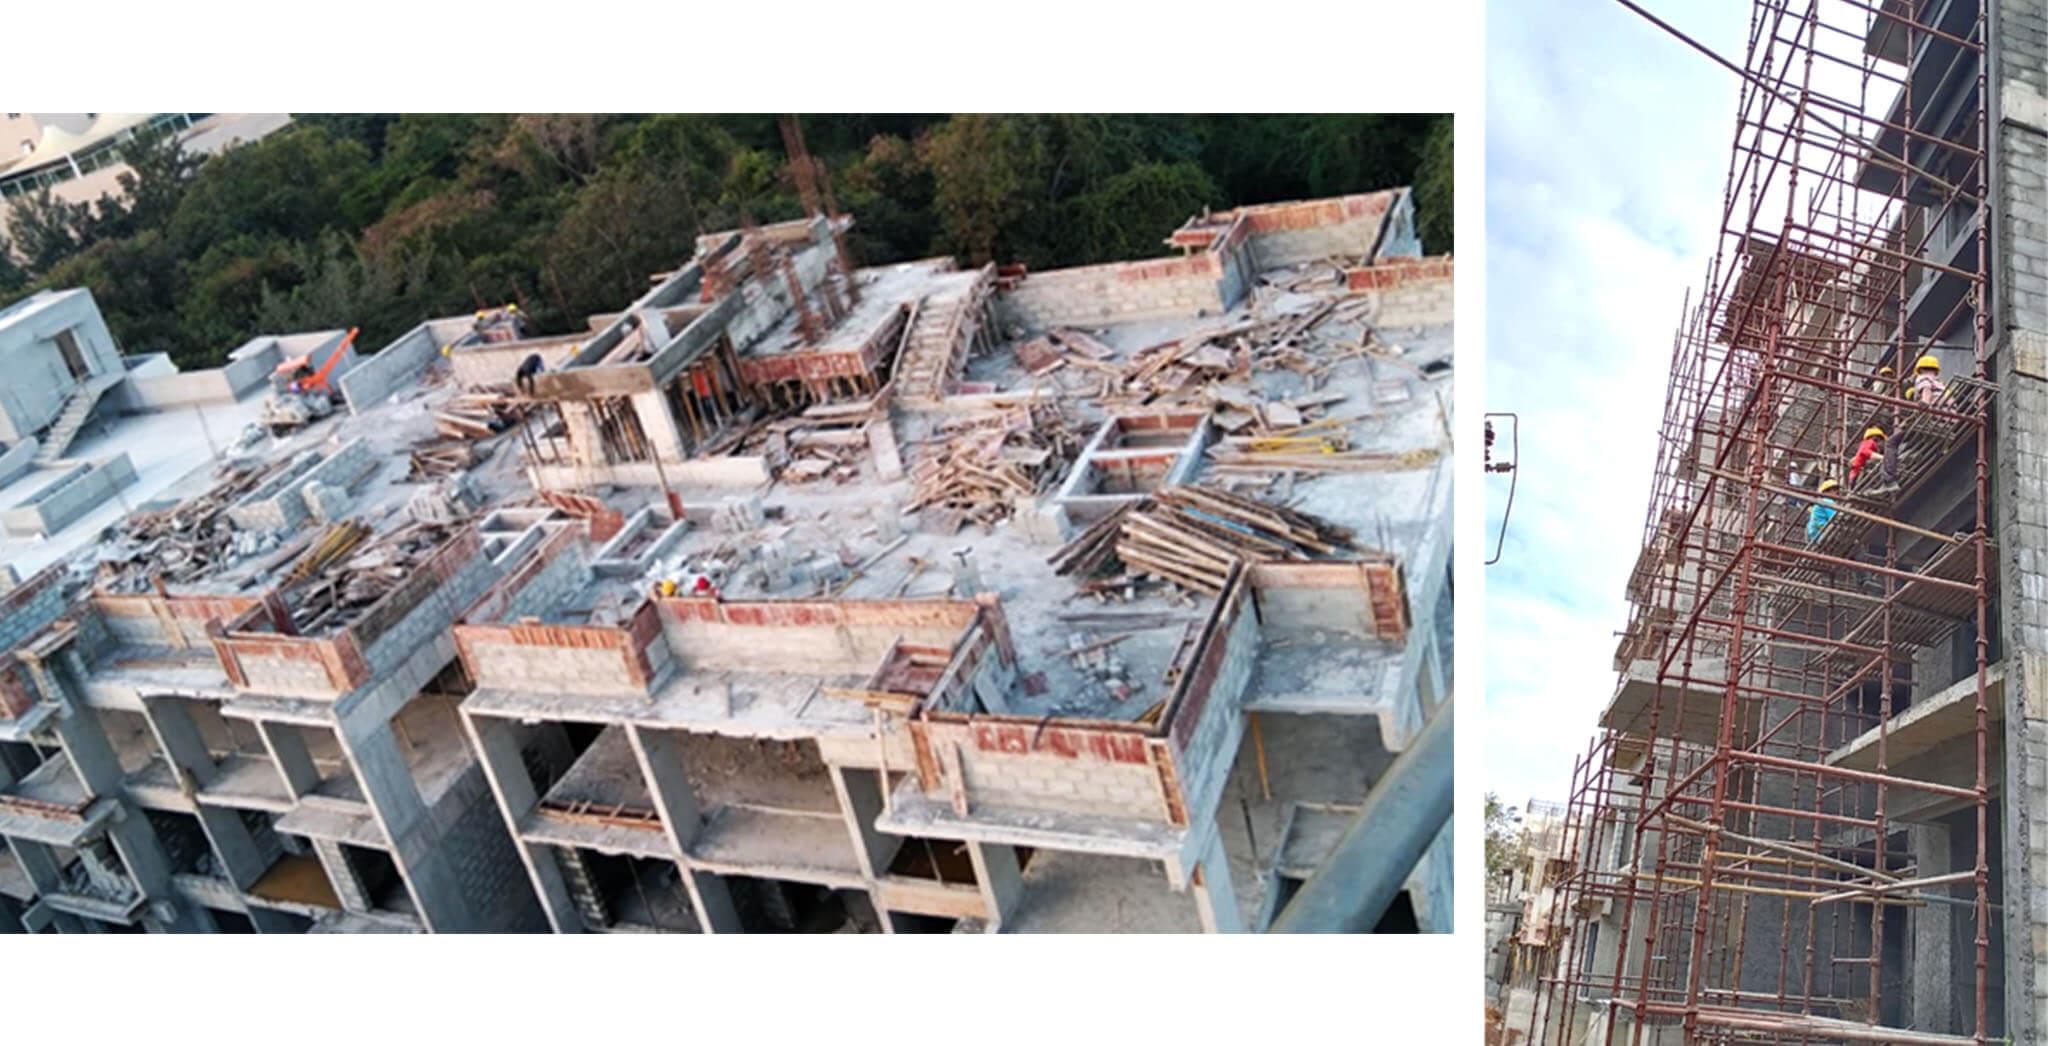 Dec 2020 - B Block: SHR and LMR bottom slab concreting work completed; North elevation external plastering, 4th floor blockwork, and 2nd floor internal plastering work-in-progress.